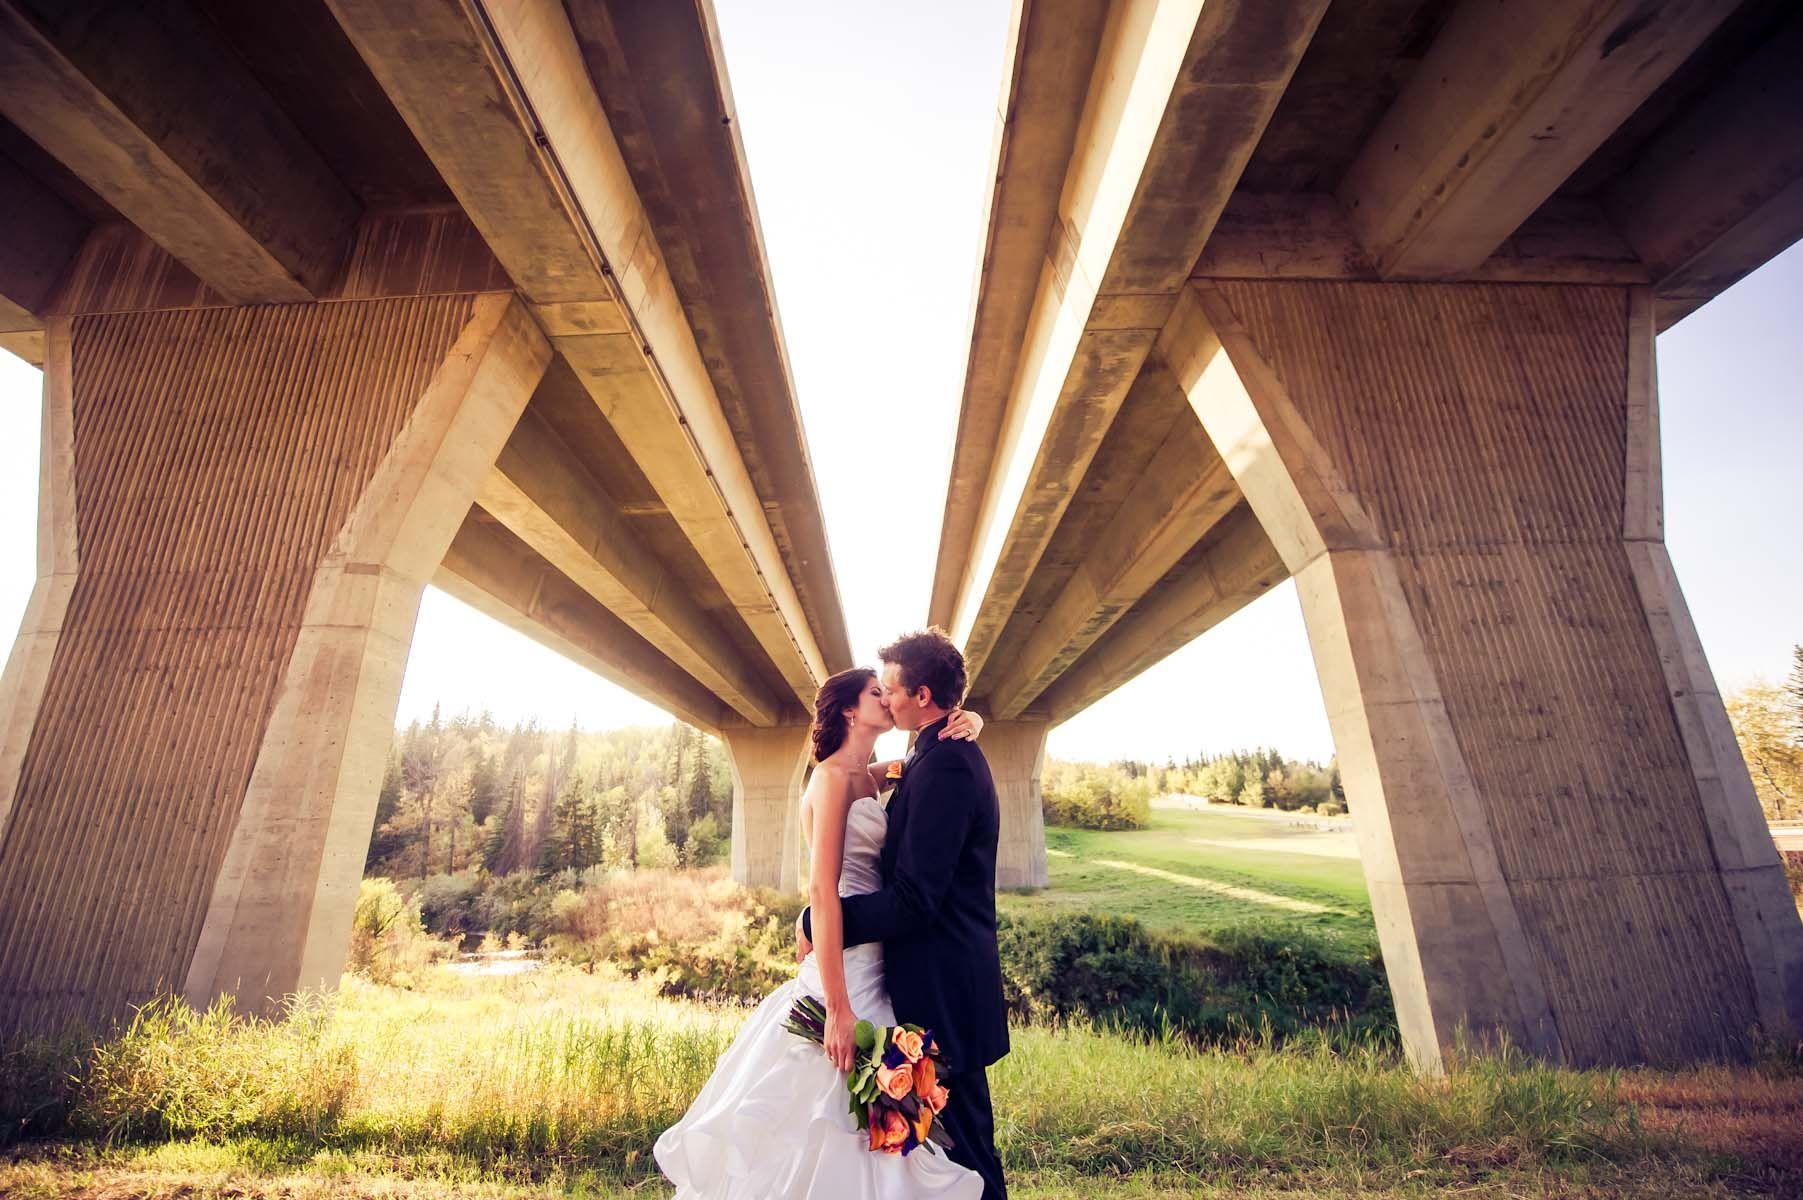 Beautiful Couple Unique Location Edmonton Wedding Photographers Fmphotostudios Edmonton Wedding Wedding Photographers Photographer